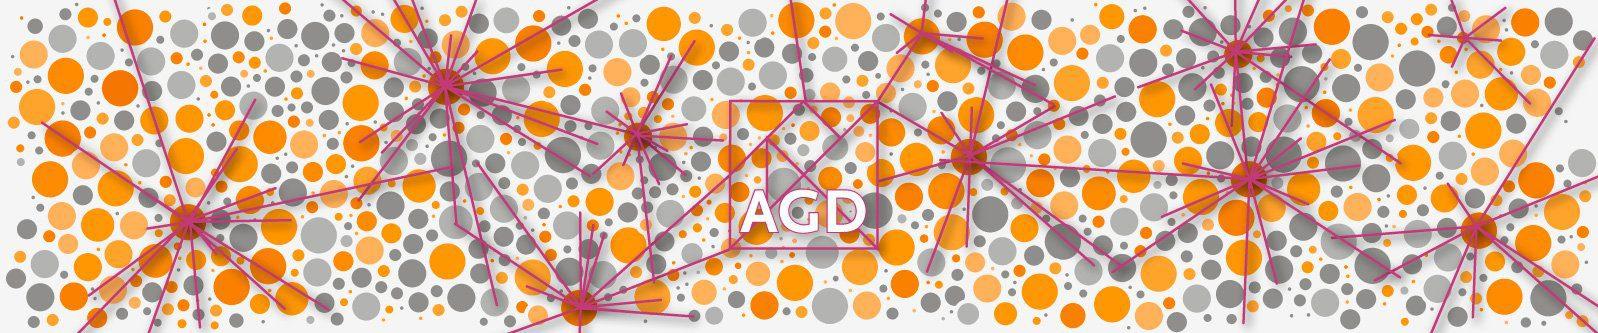 AGD-Beraternetzwerk